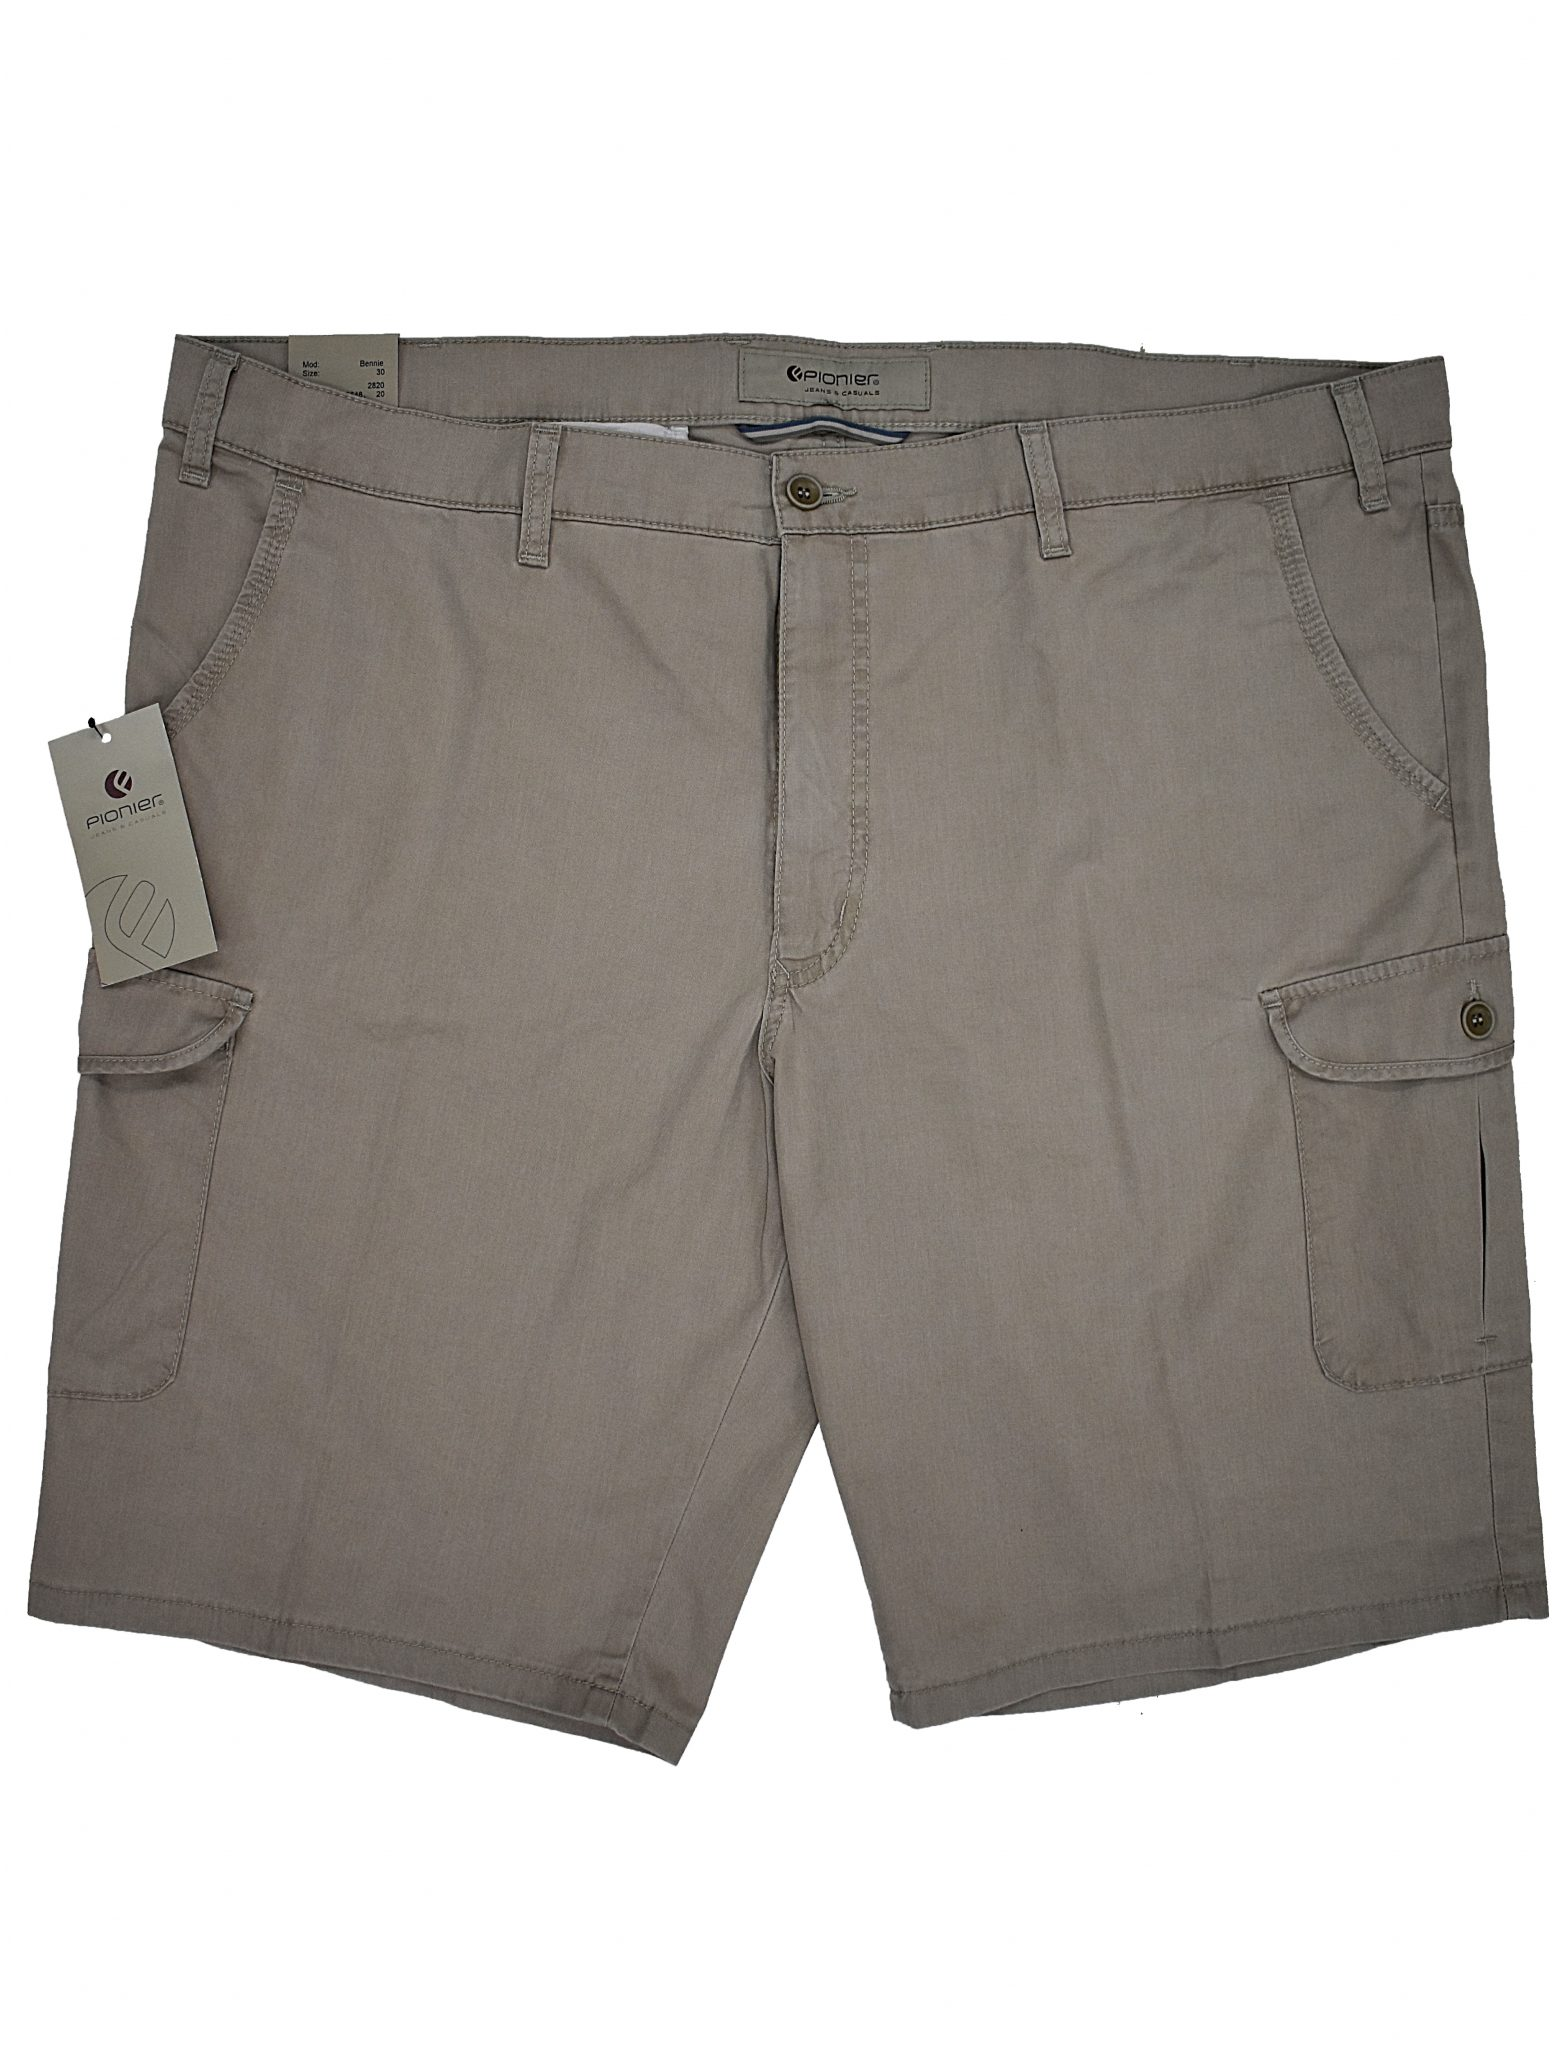 Pionier grote maat korte broek beige